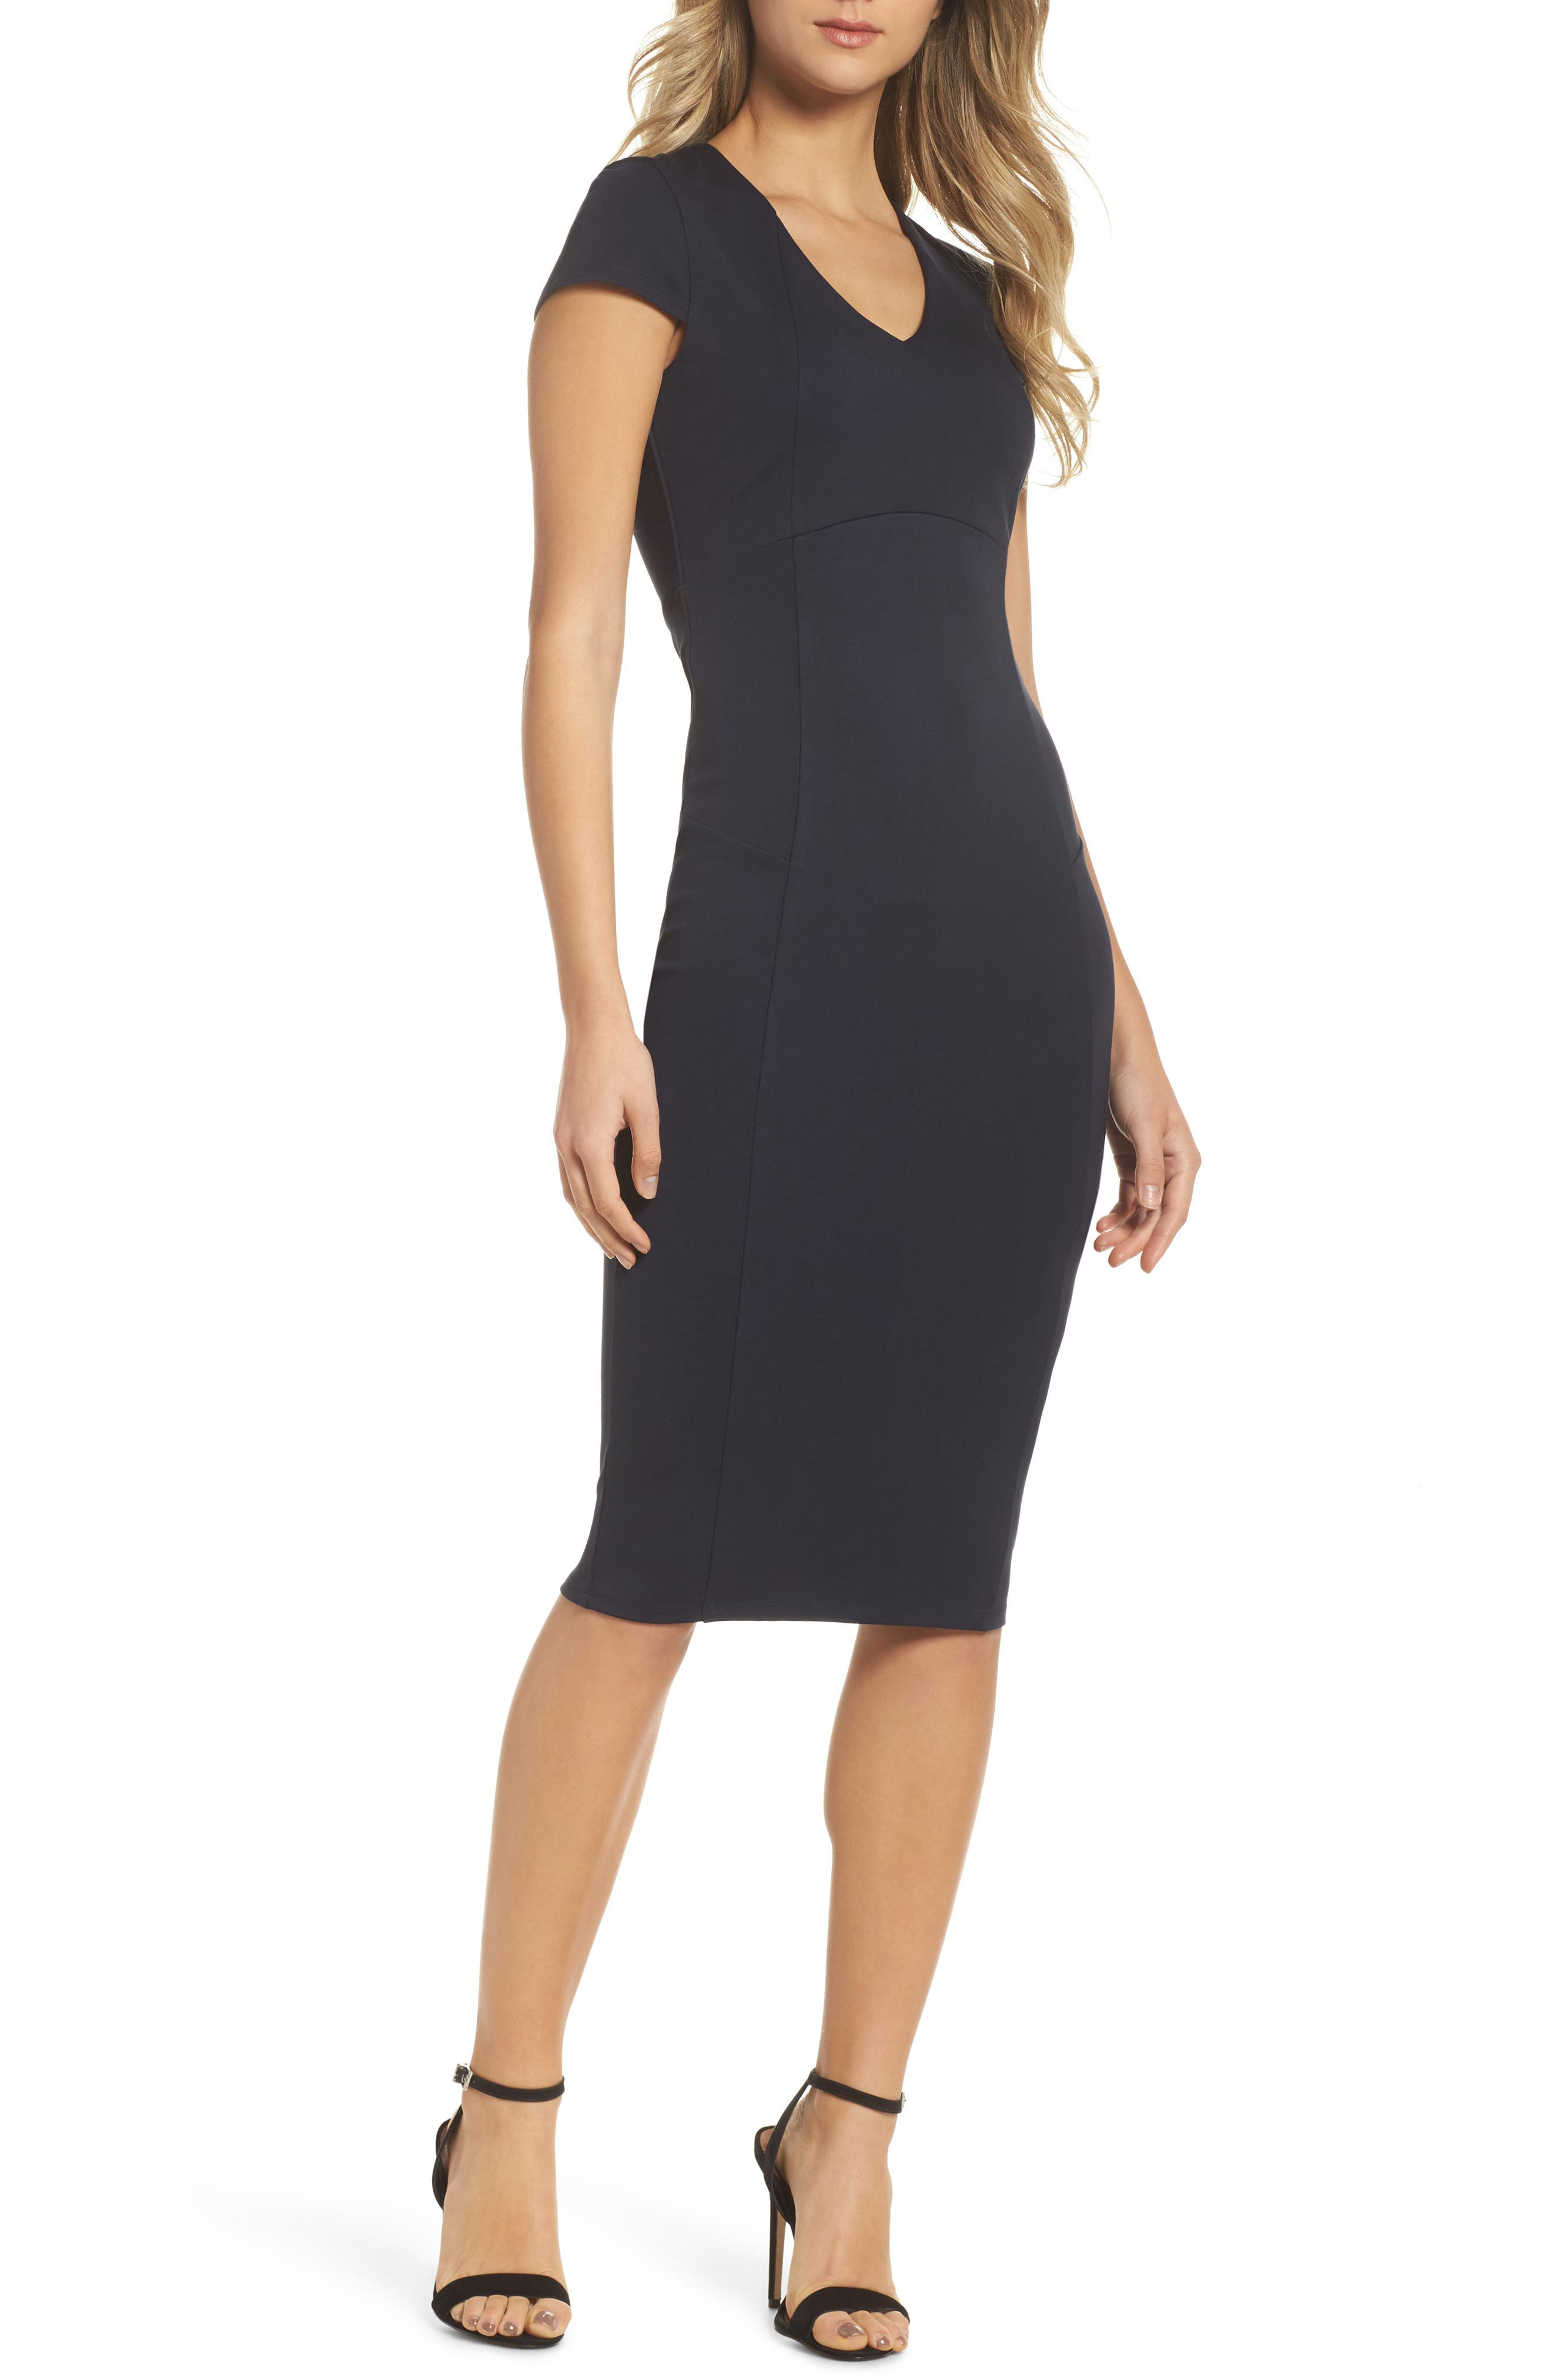 Felicity & Coco Nikki Body-Con Dress (Nordstrom Exclusive)